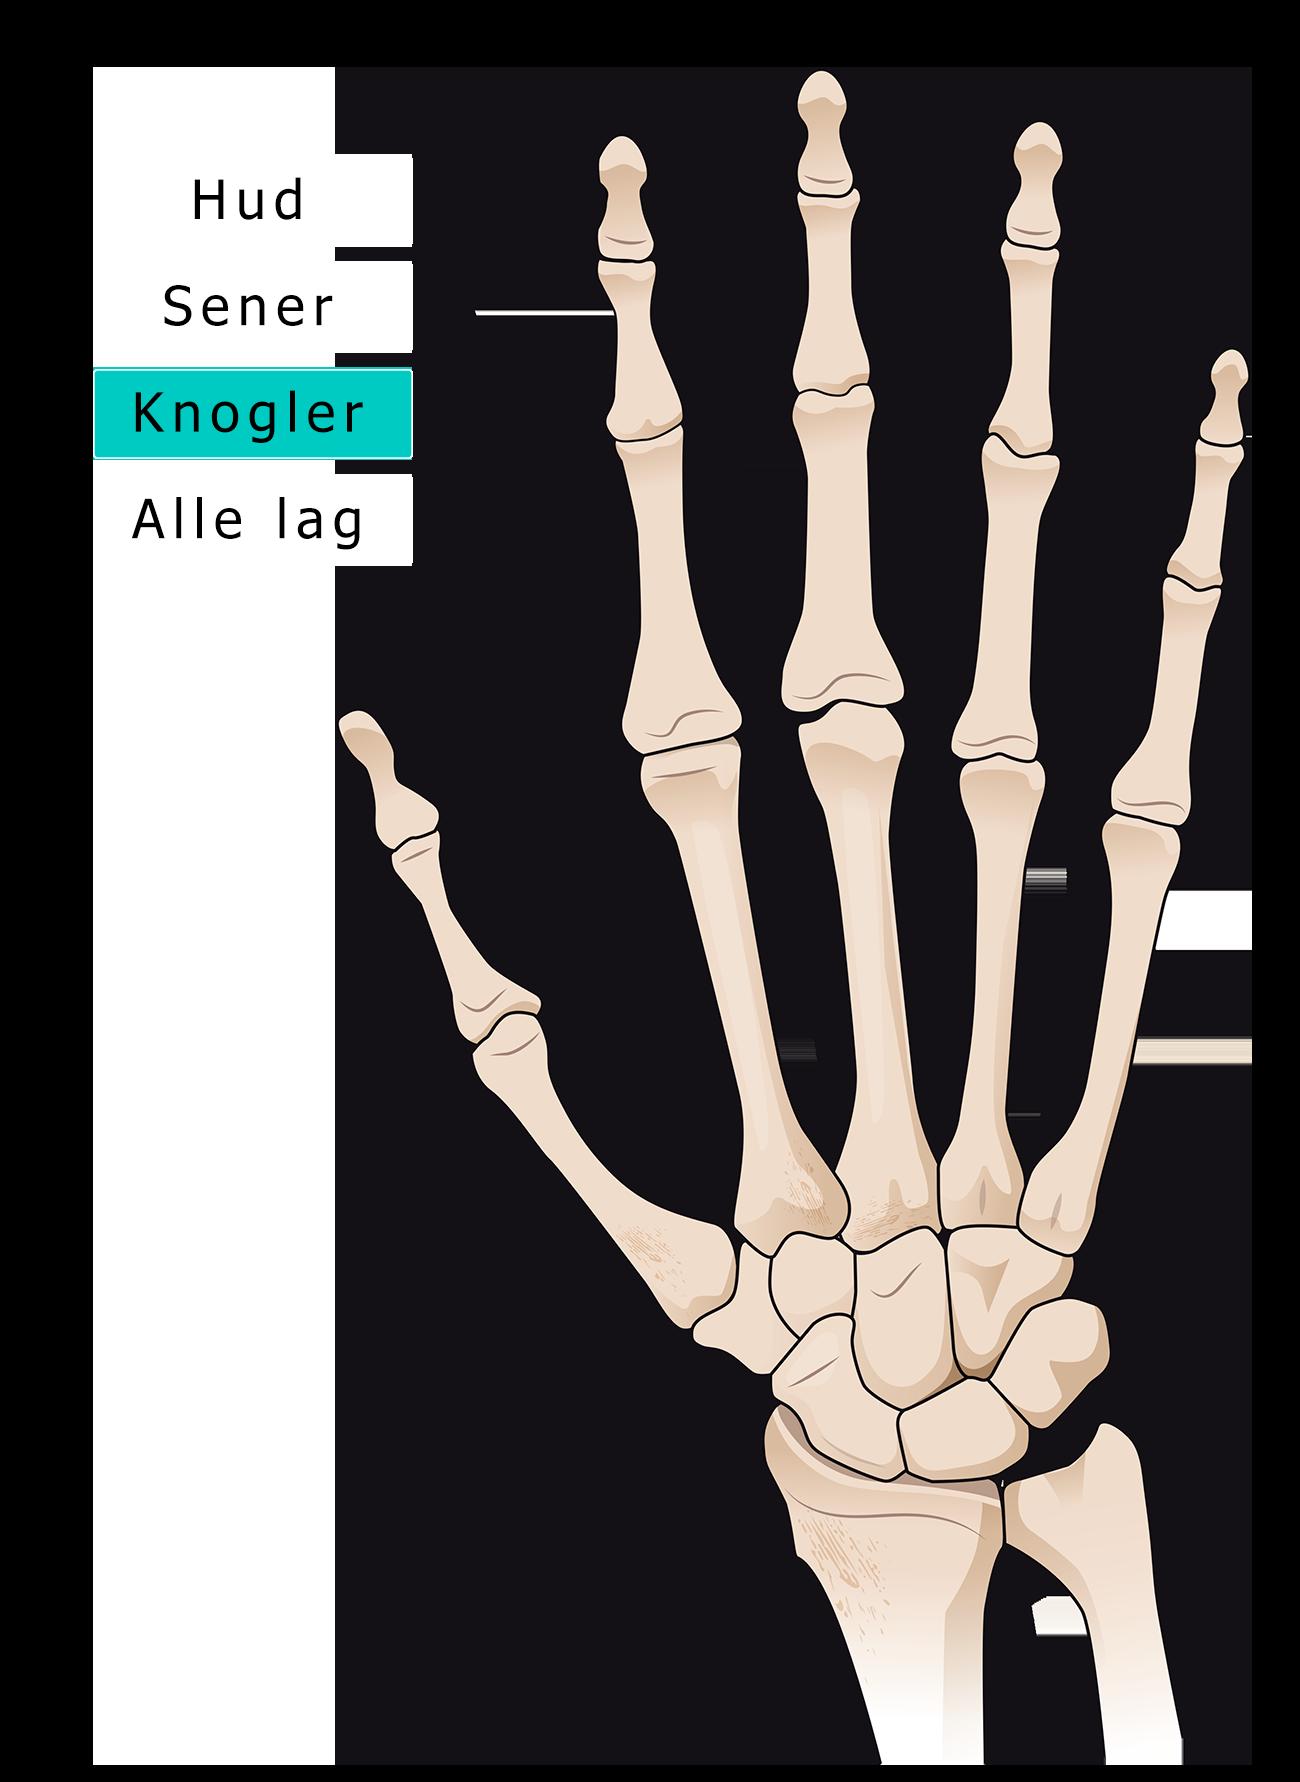 Hånd knogler